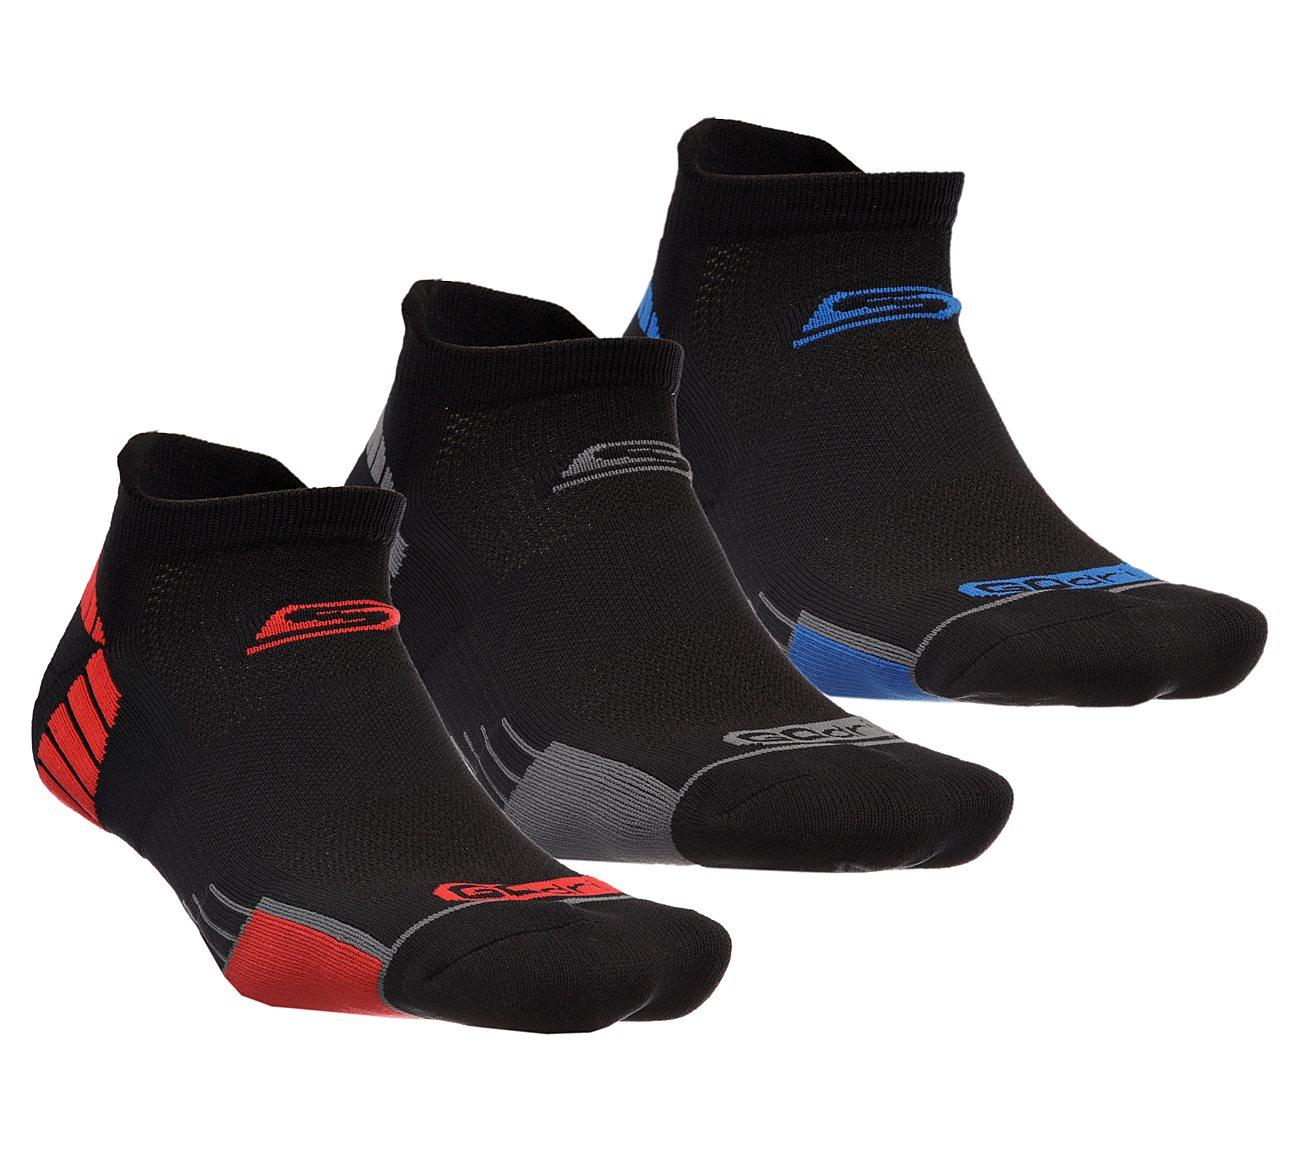 3 Pack Low Cut GOrun Socks